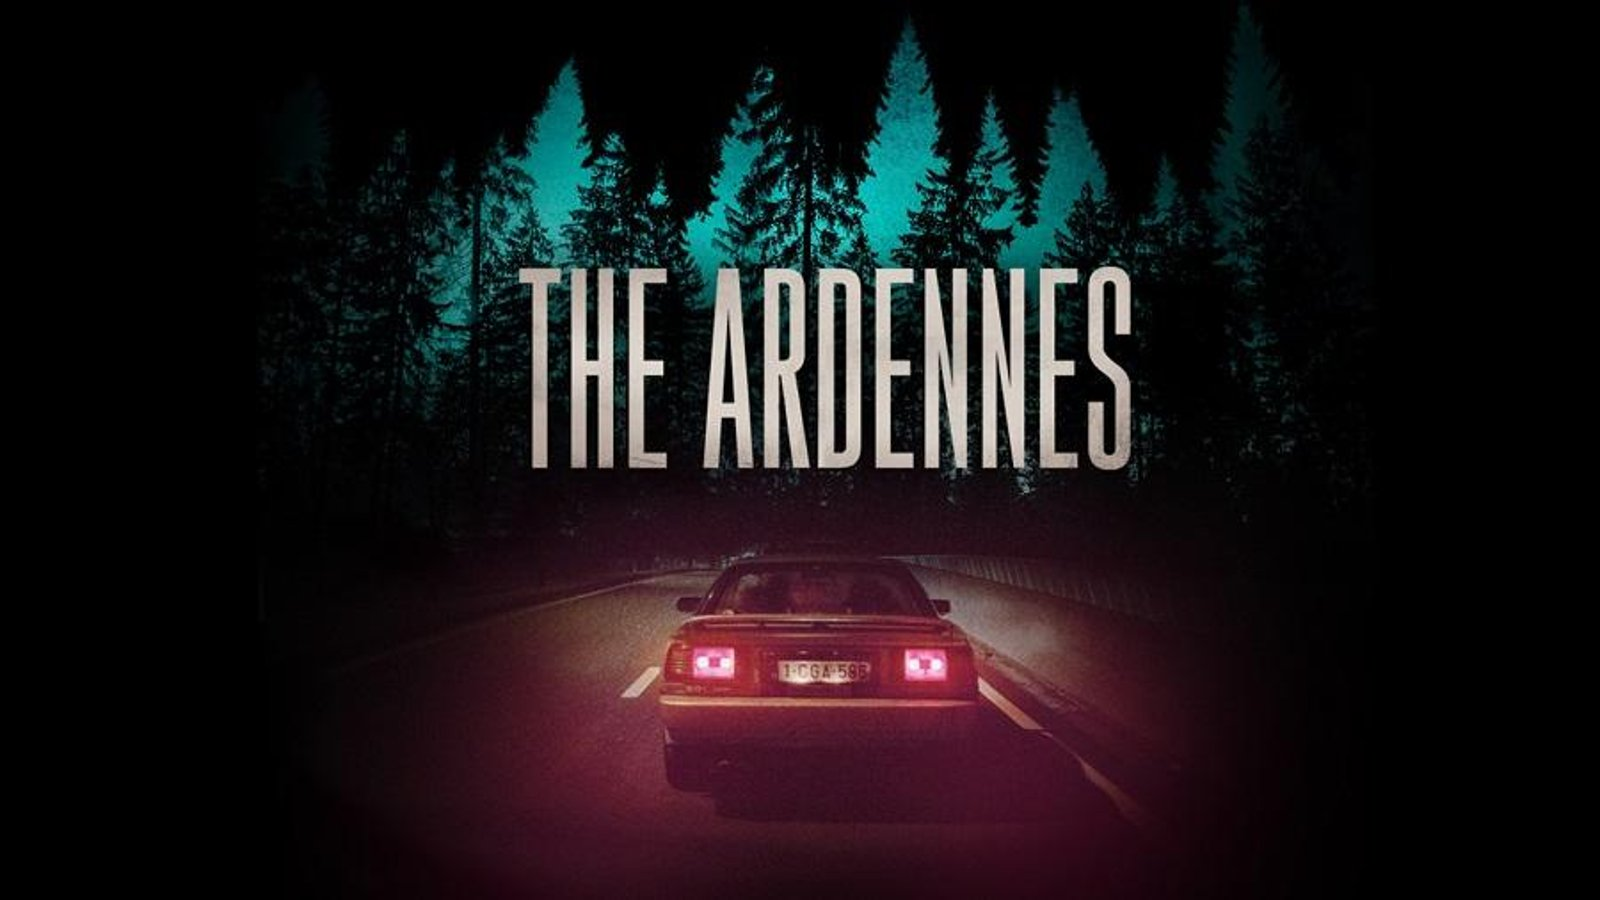 The Ardennes - D'Ardennen